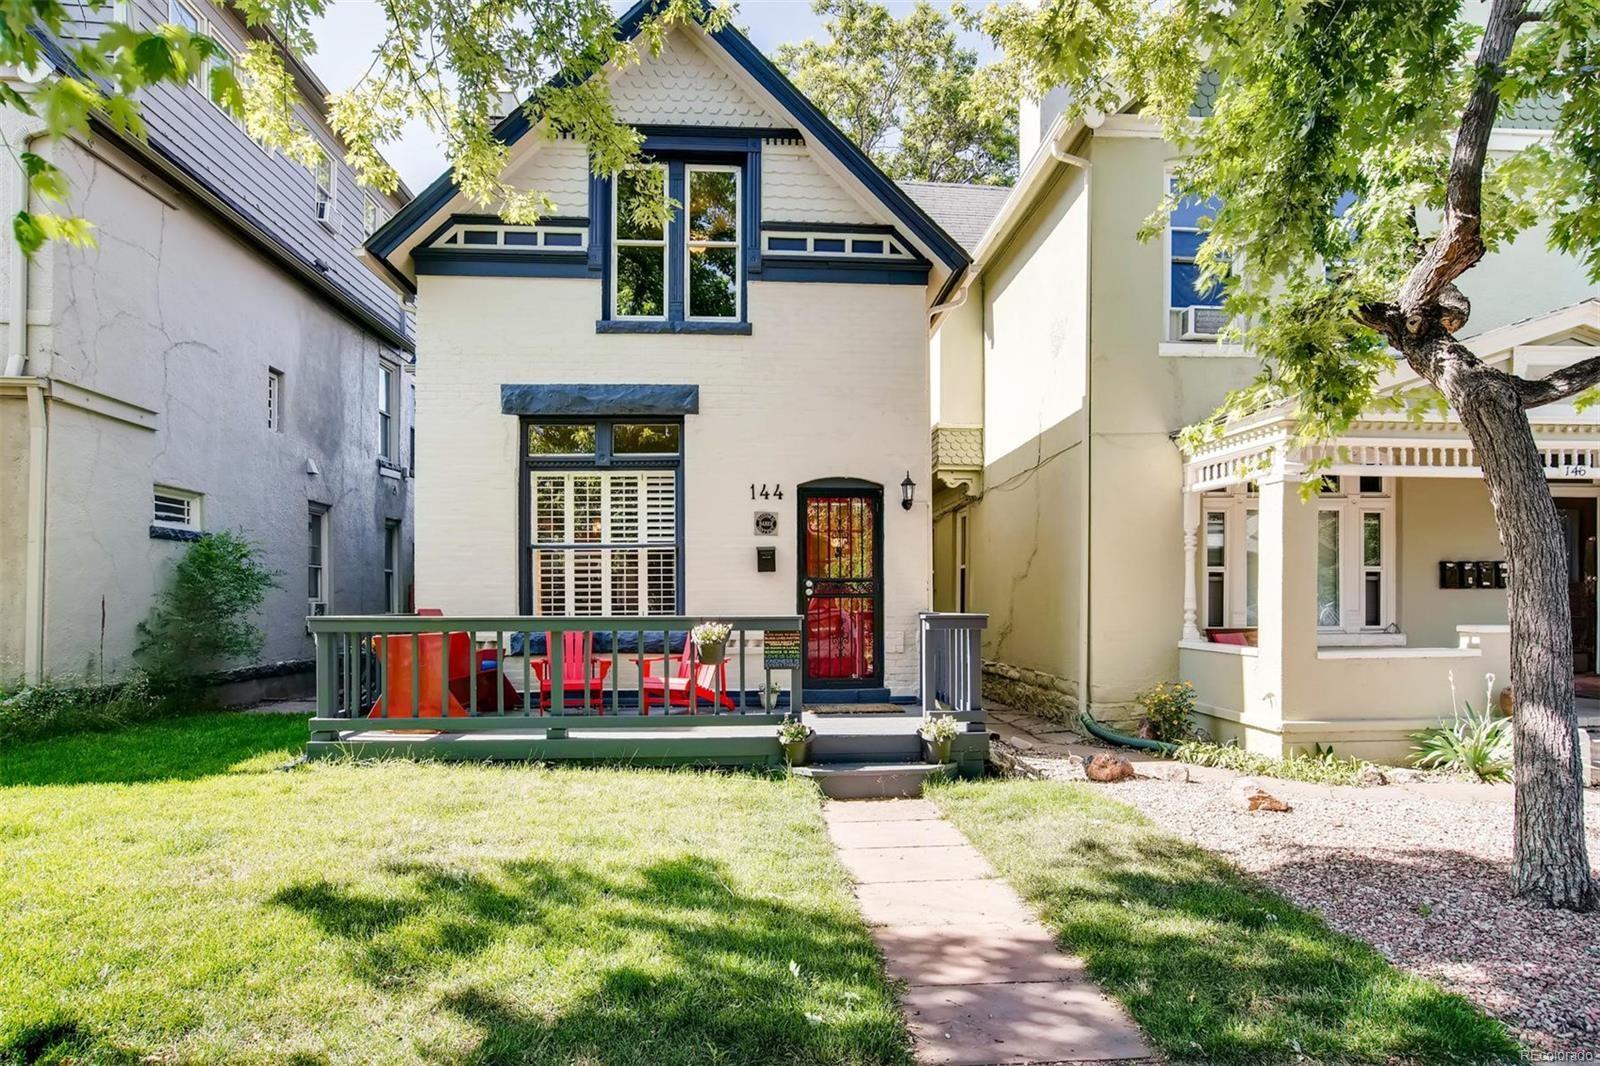 MLS# 1697462 - 2 - 144 W Ellsworth Avenue, Denver, CO 80223